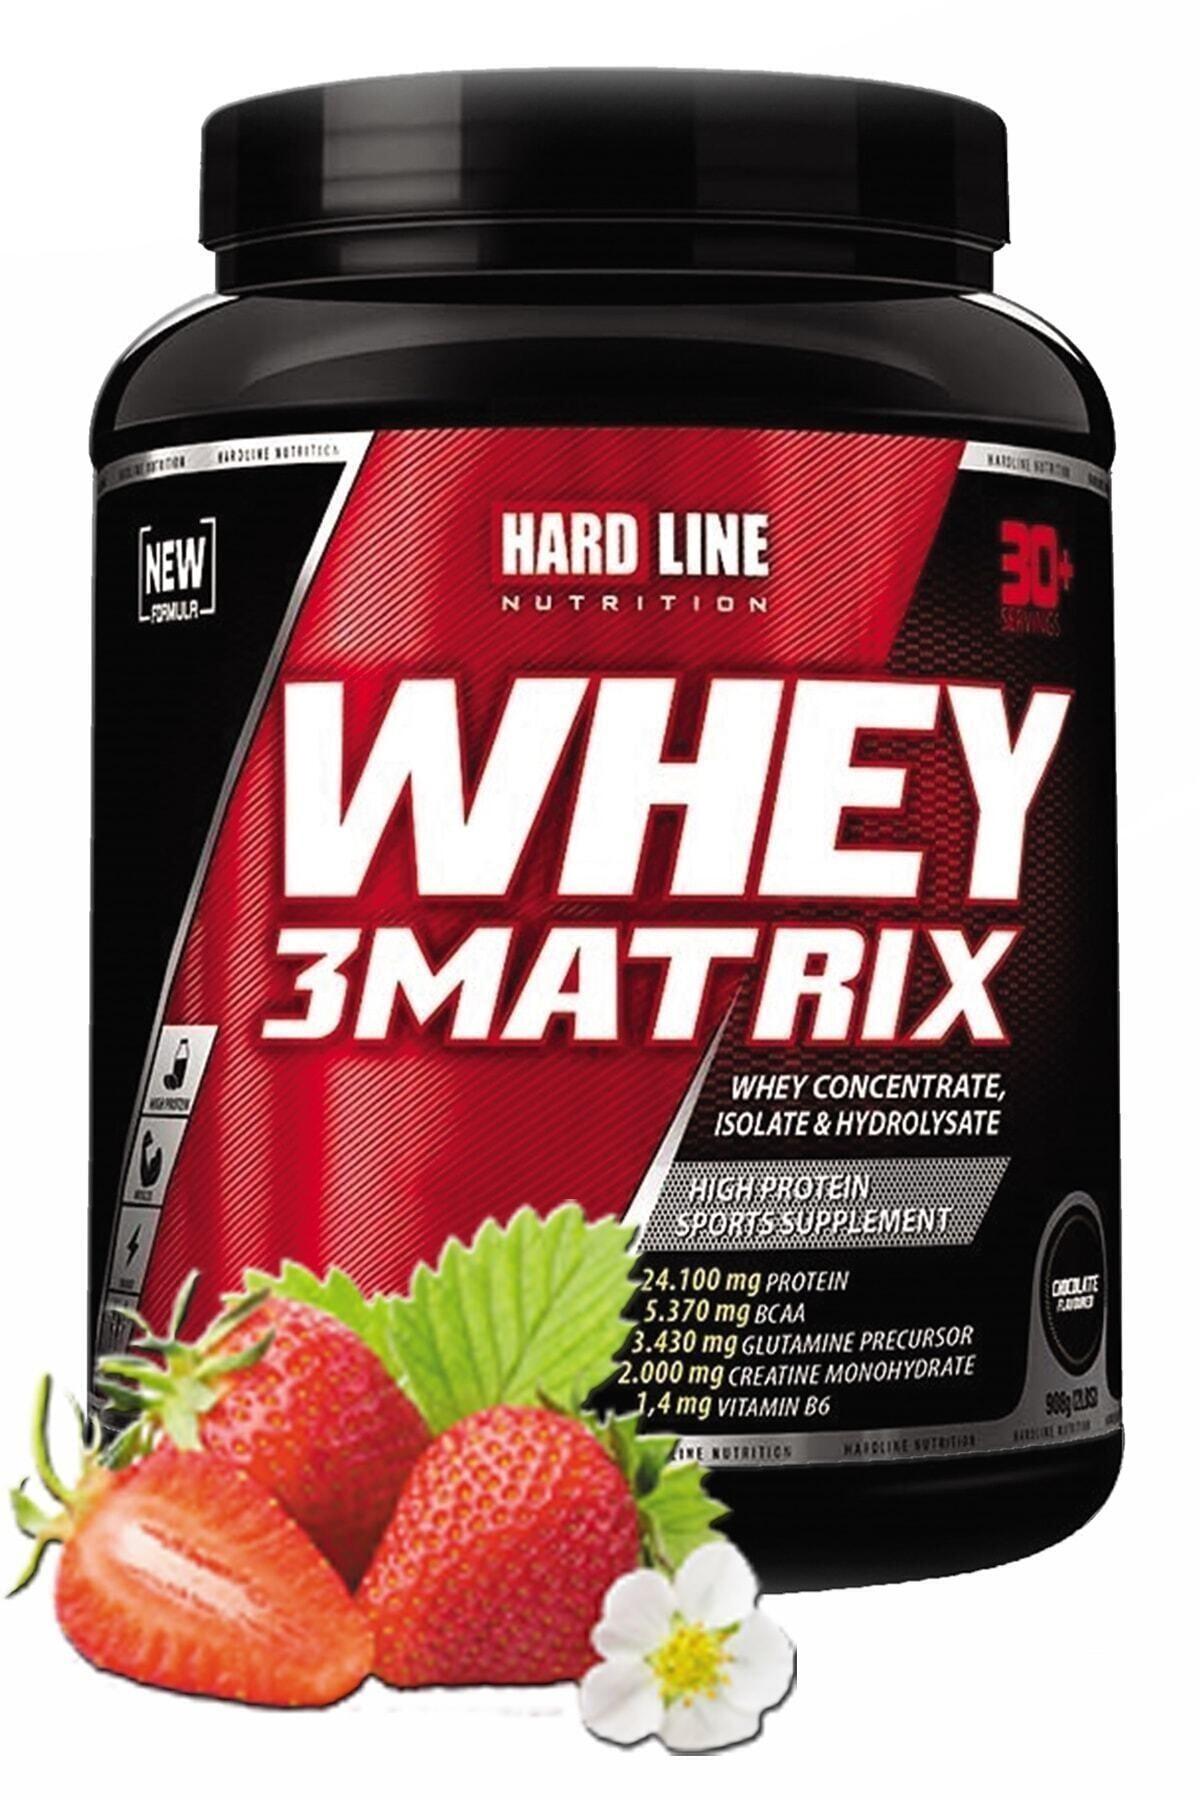 Hardline Whey 3 Matrix Çilekli 908 gr Protein Tozu 1